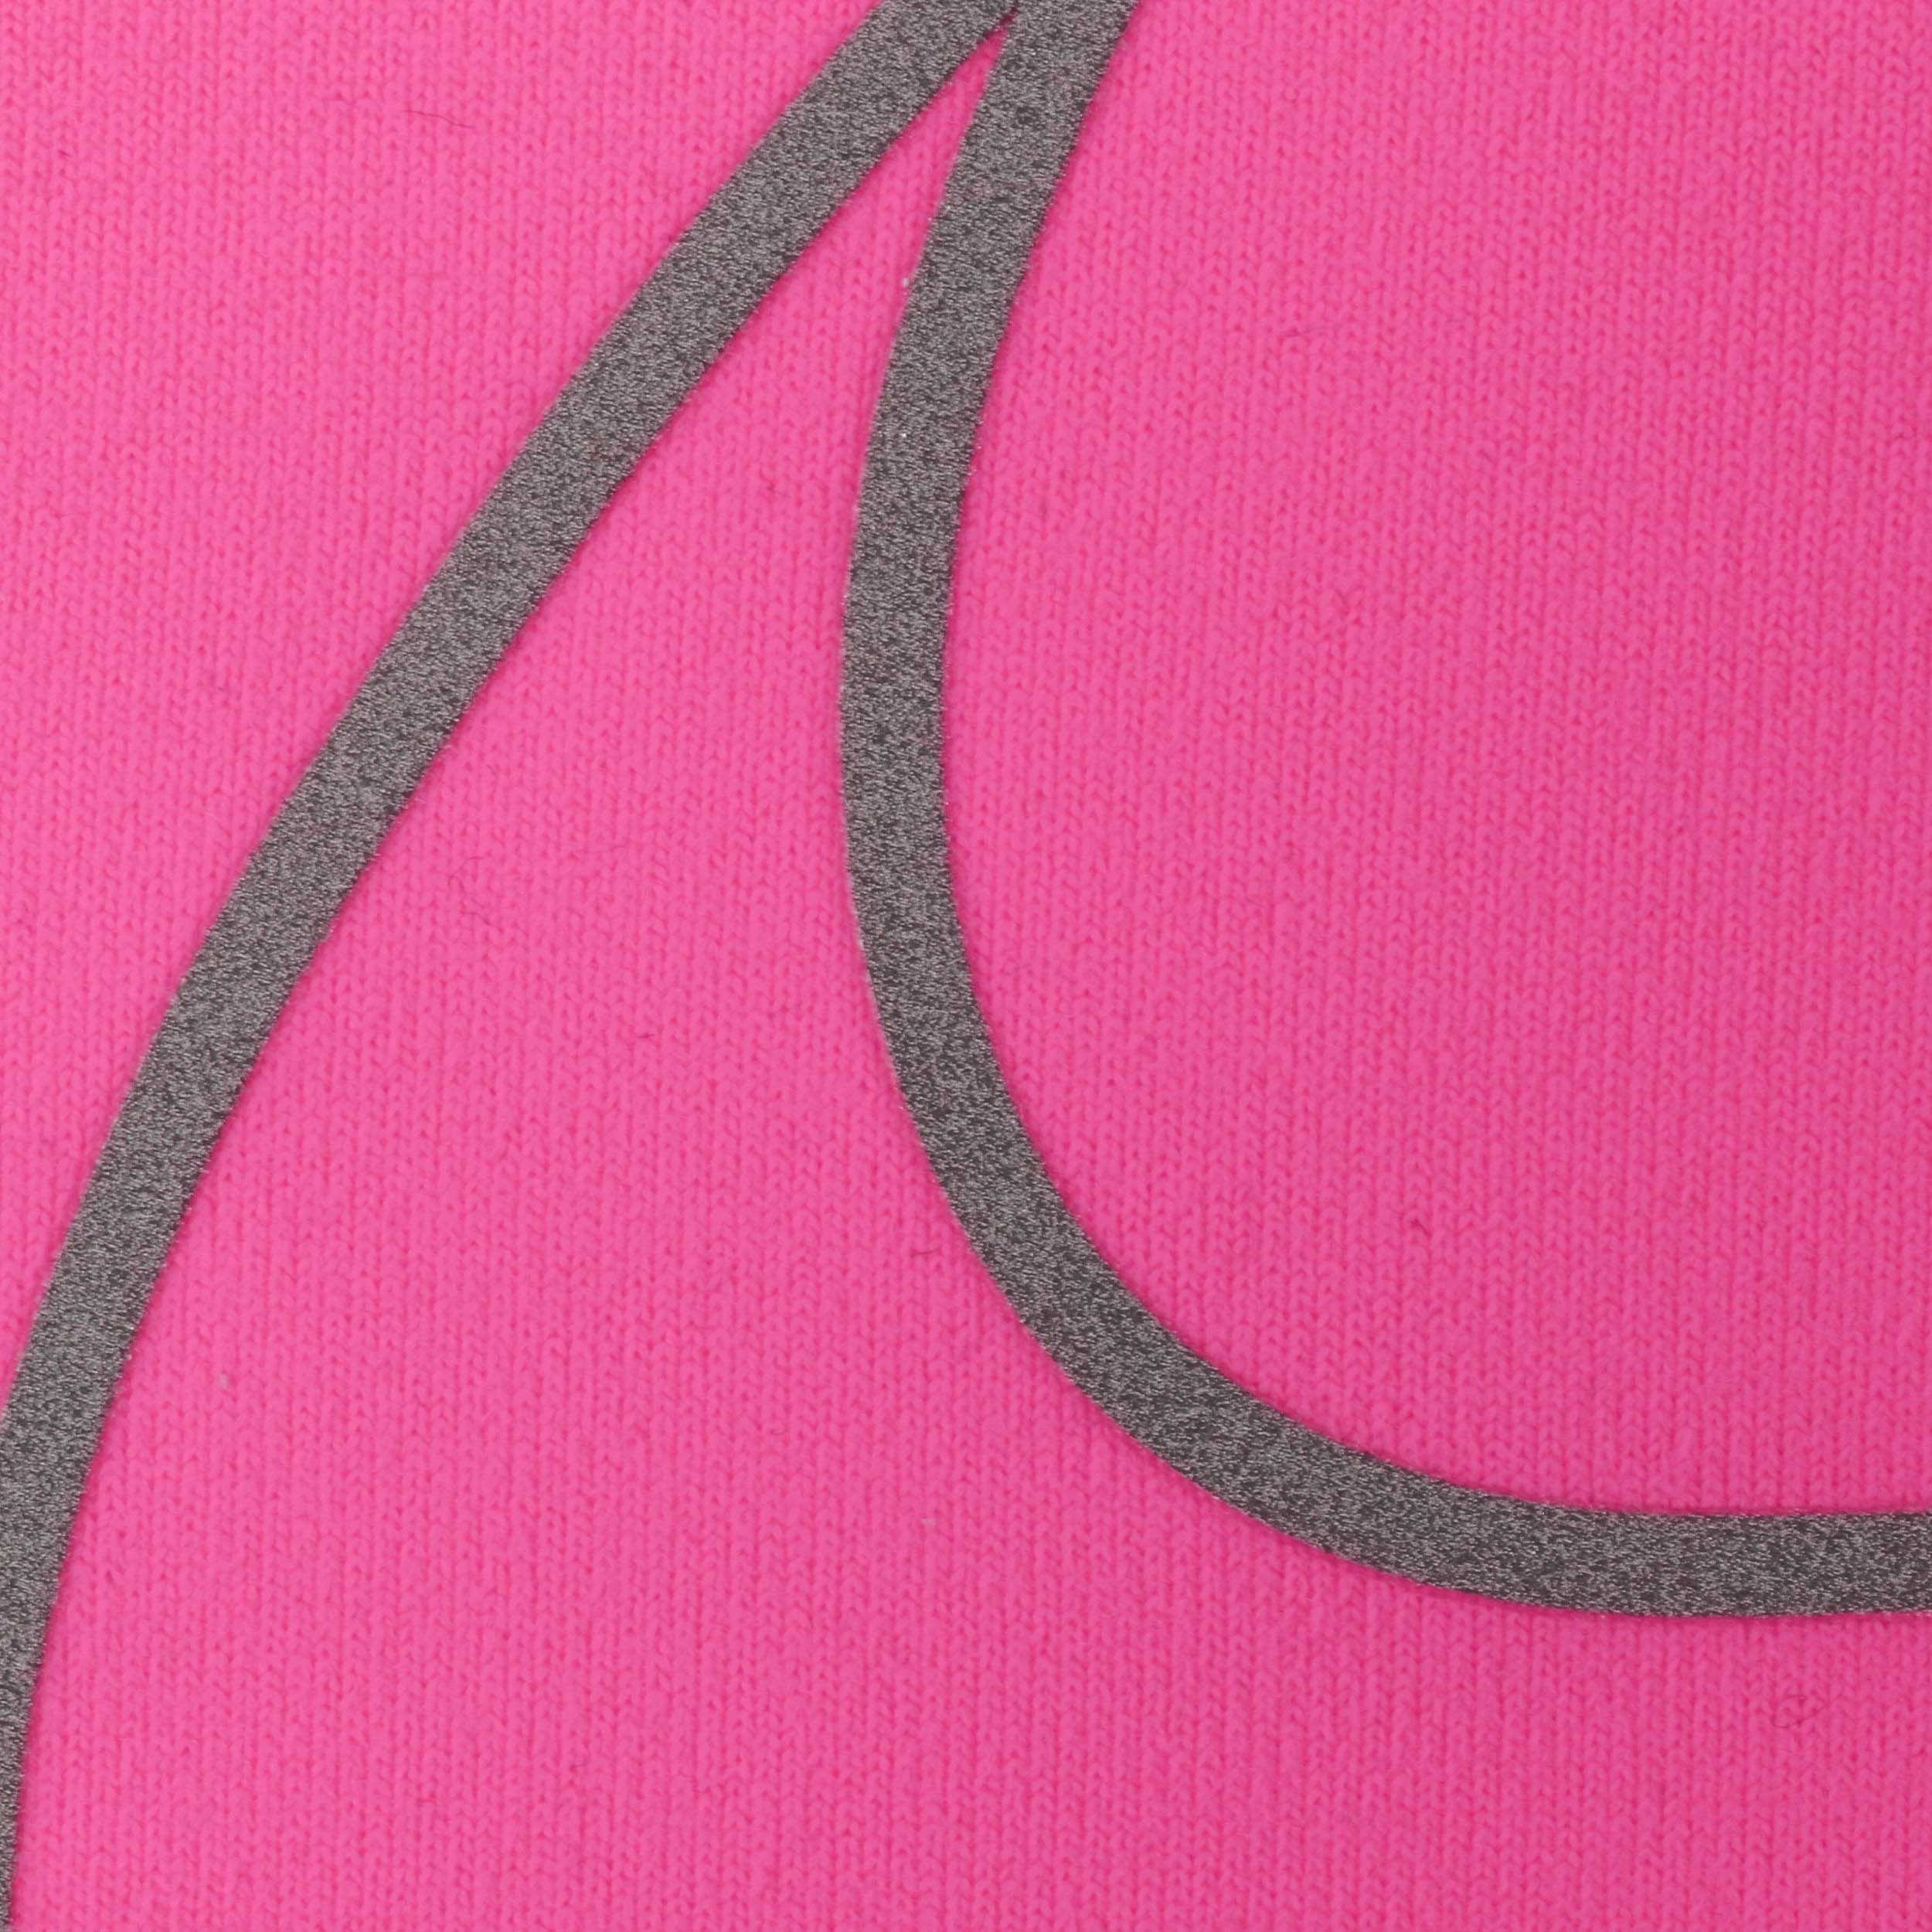 ... Dri-Fit Swoosh Running Headband by Nike - pink 2 ... 6cbefcbb619